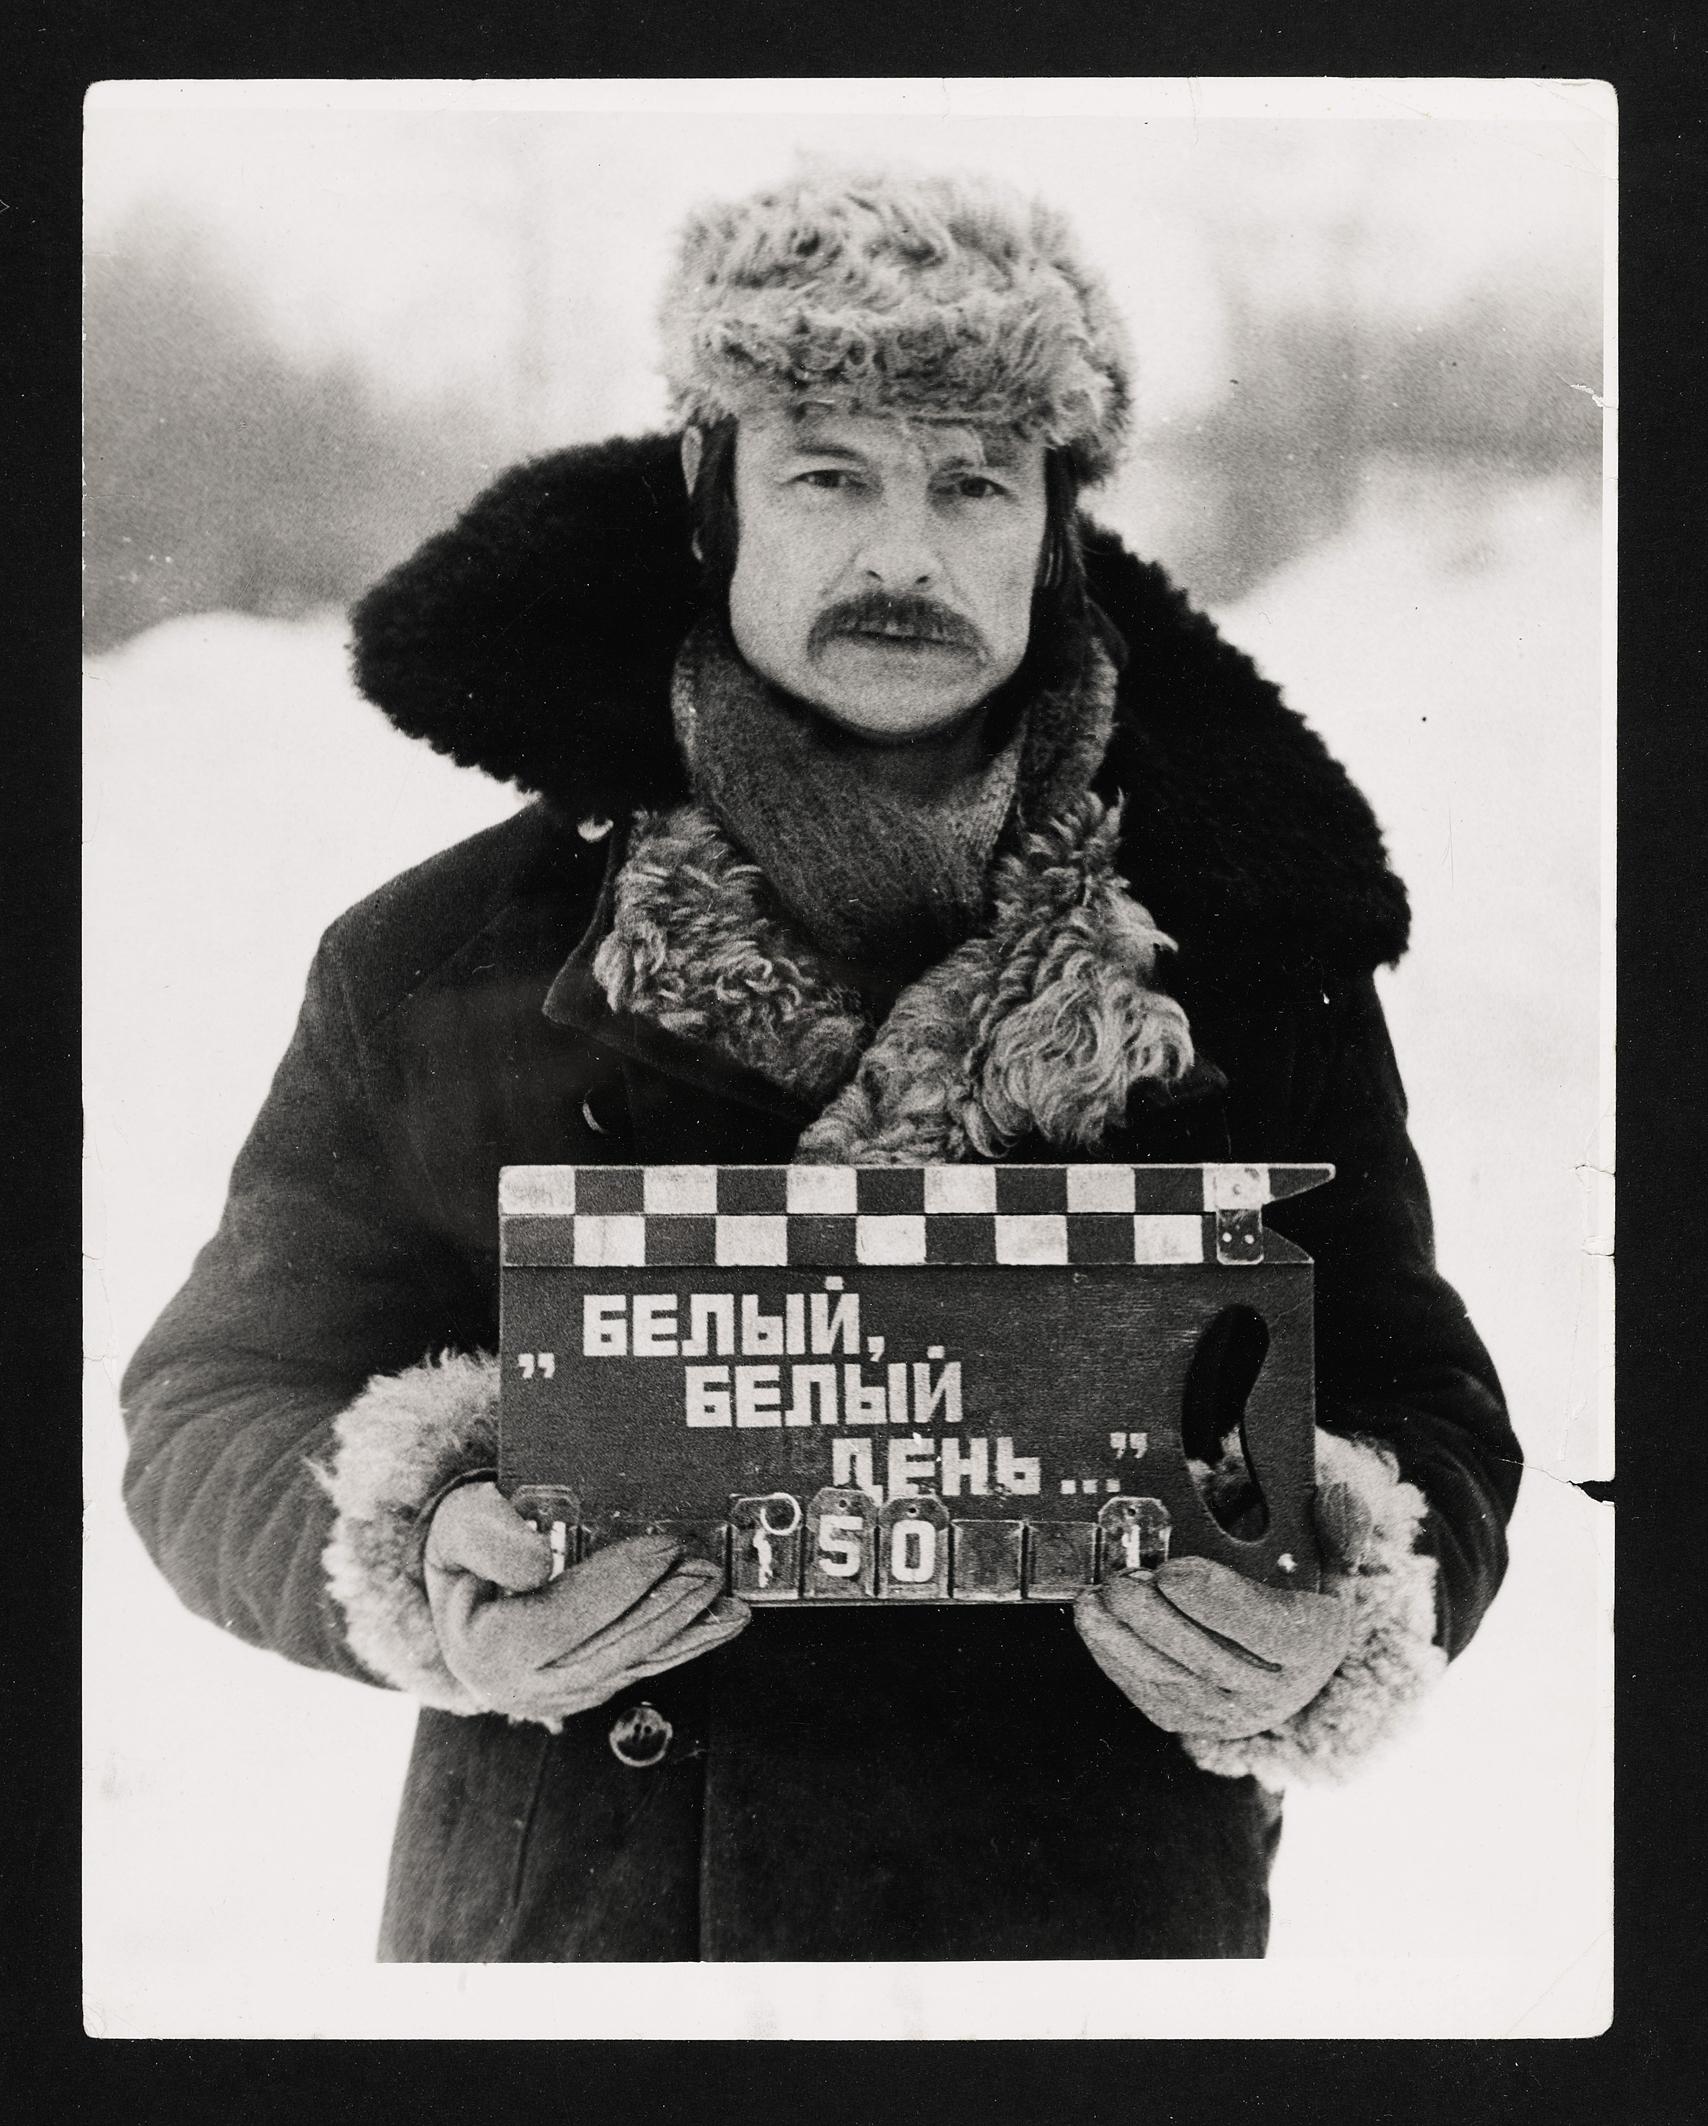 Pushing Artistic Boundaries in the Soviet Union